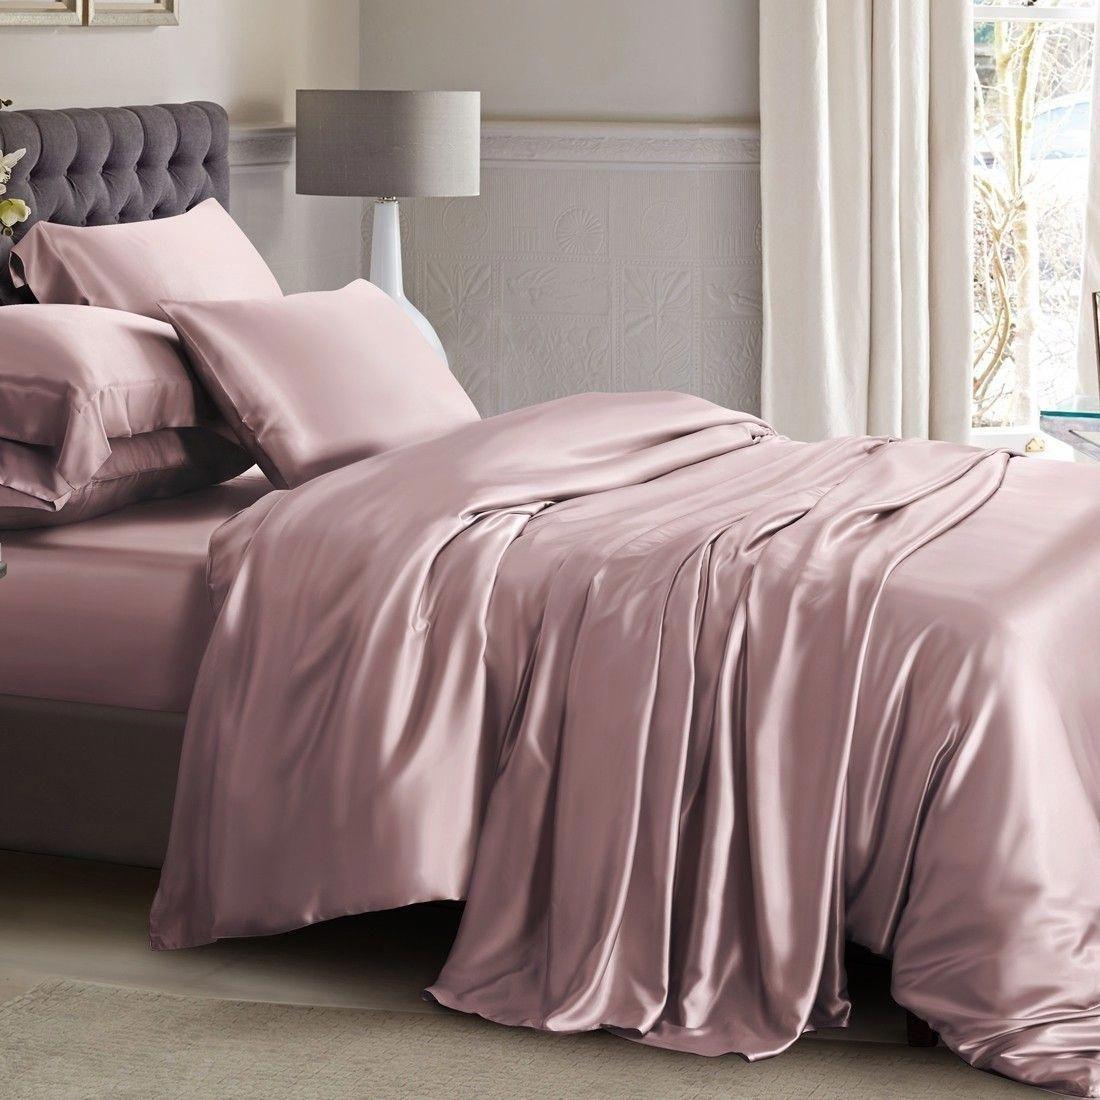 Bespoke Silk Bed Linen In 2020 Silk Bed Sheets Bed Linen Design